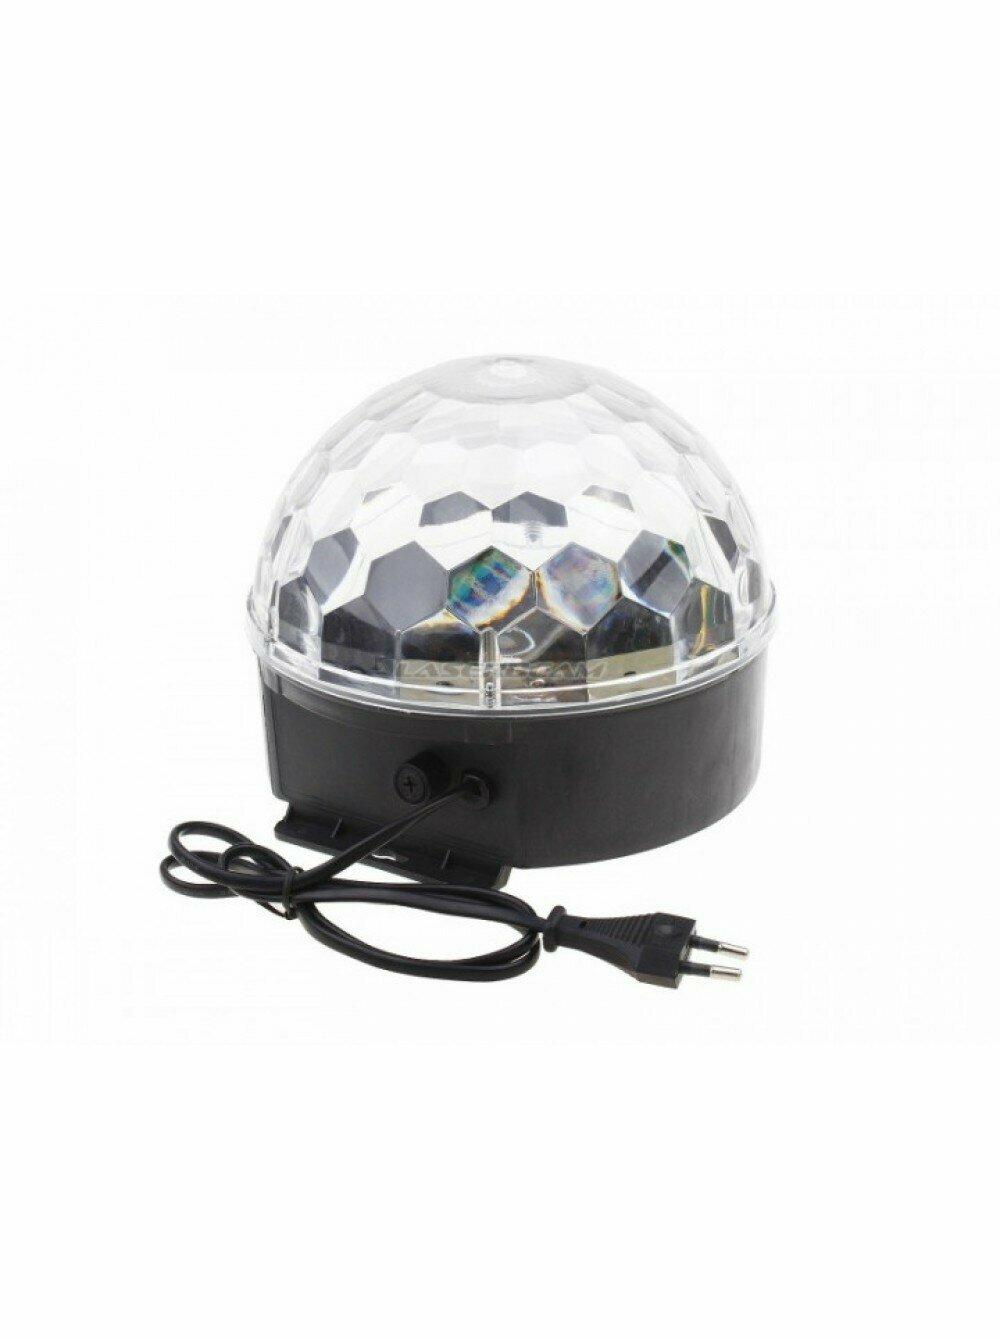 Лампа Led Crystal Magic Ball в Богородицке